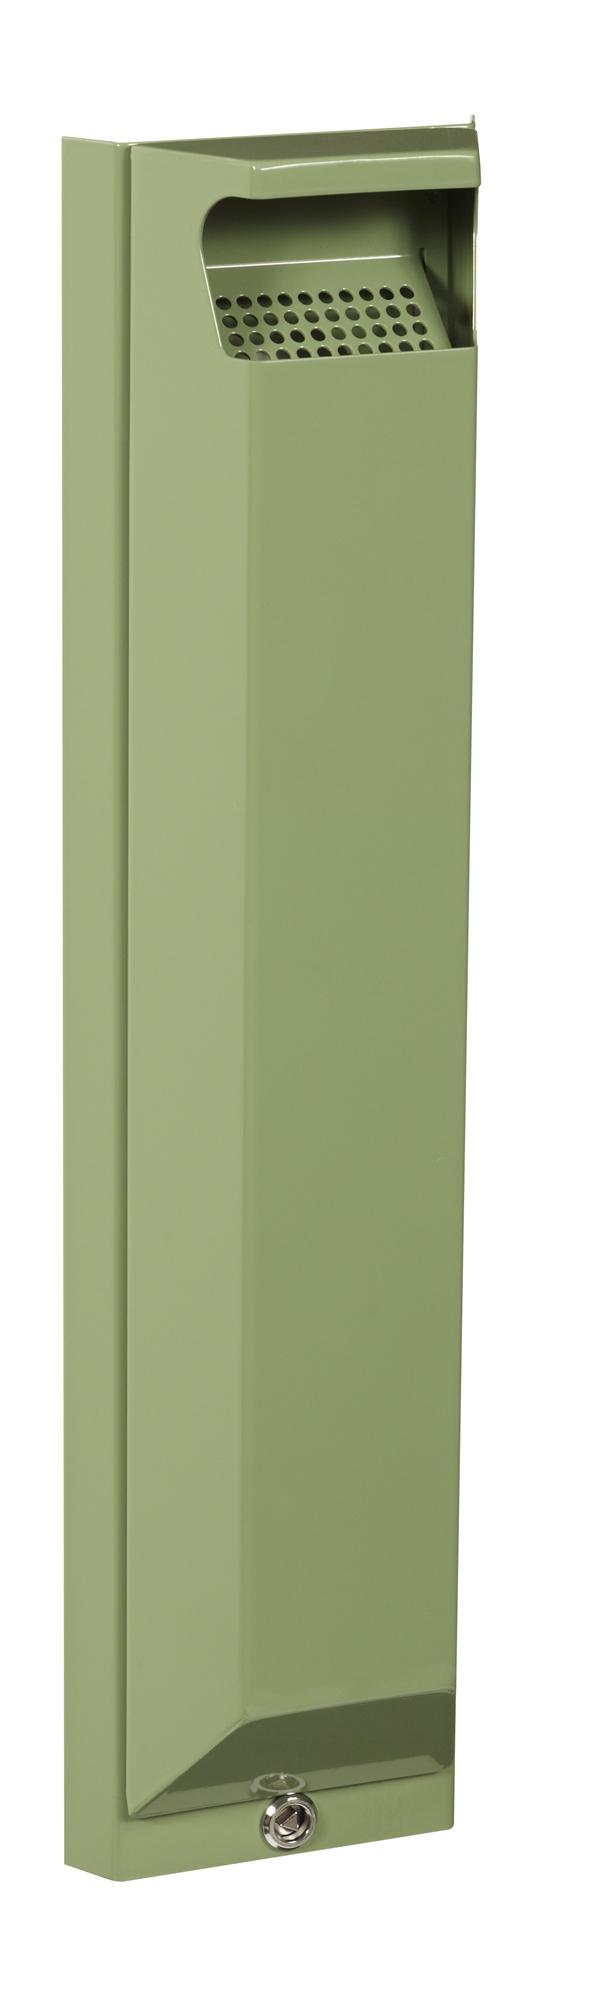 Cendrier exterieur rossignol mural 3l serrure vert reseda for Cendrier mural rossignol